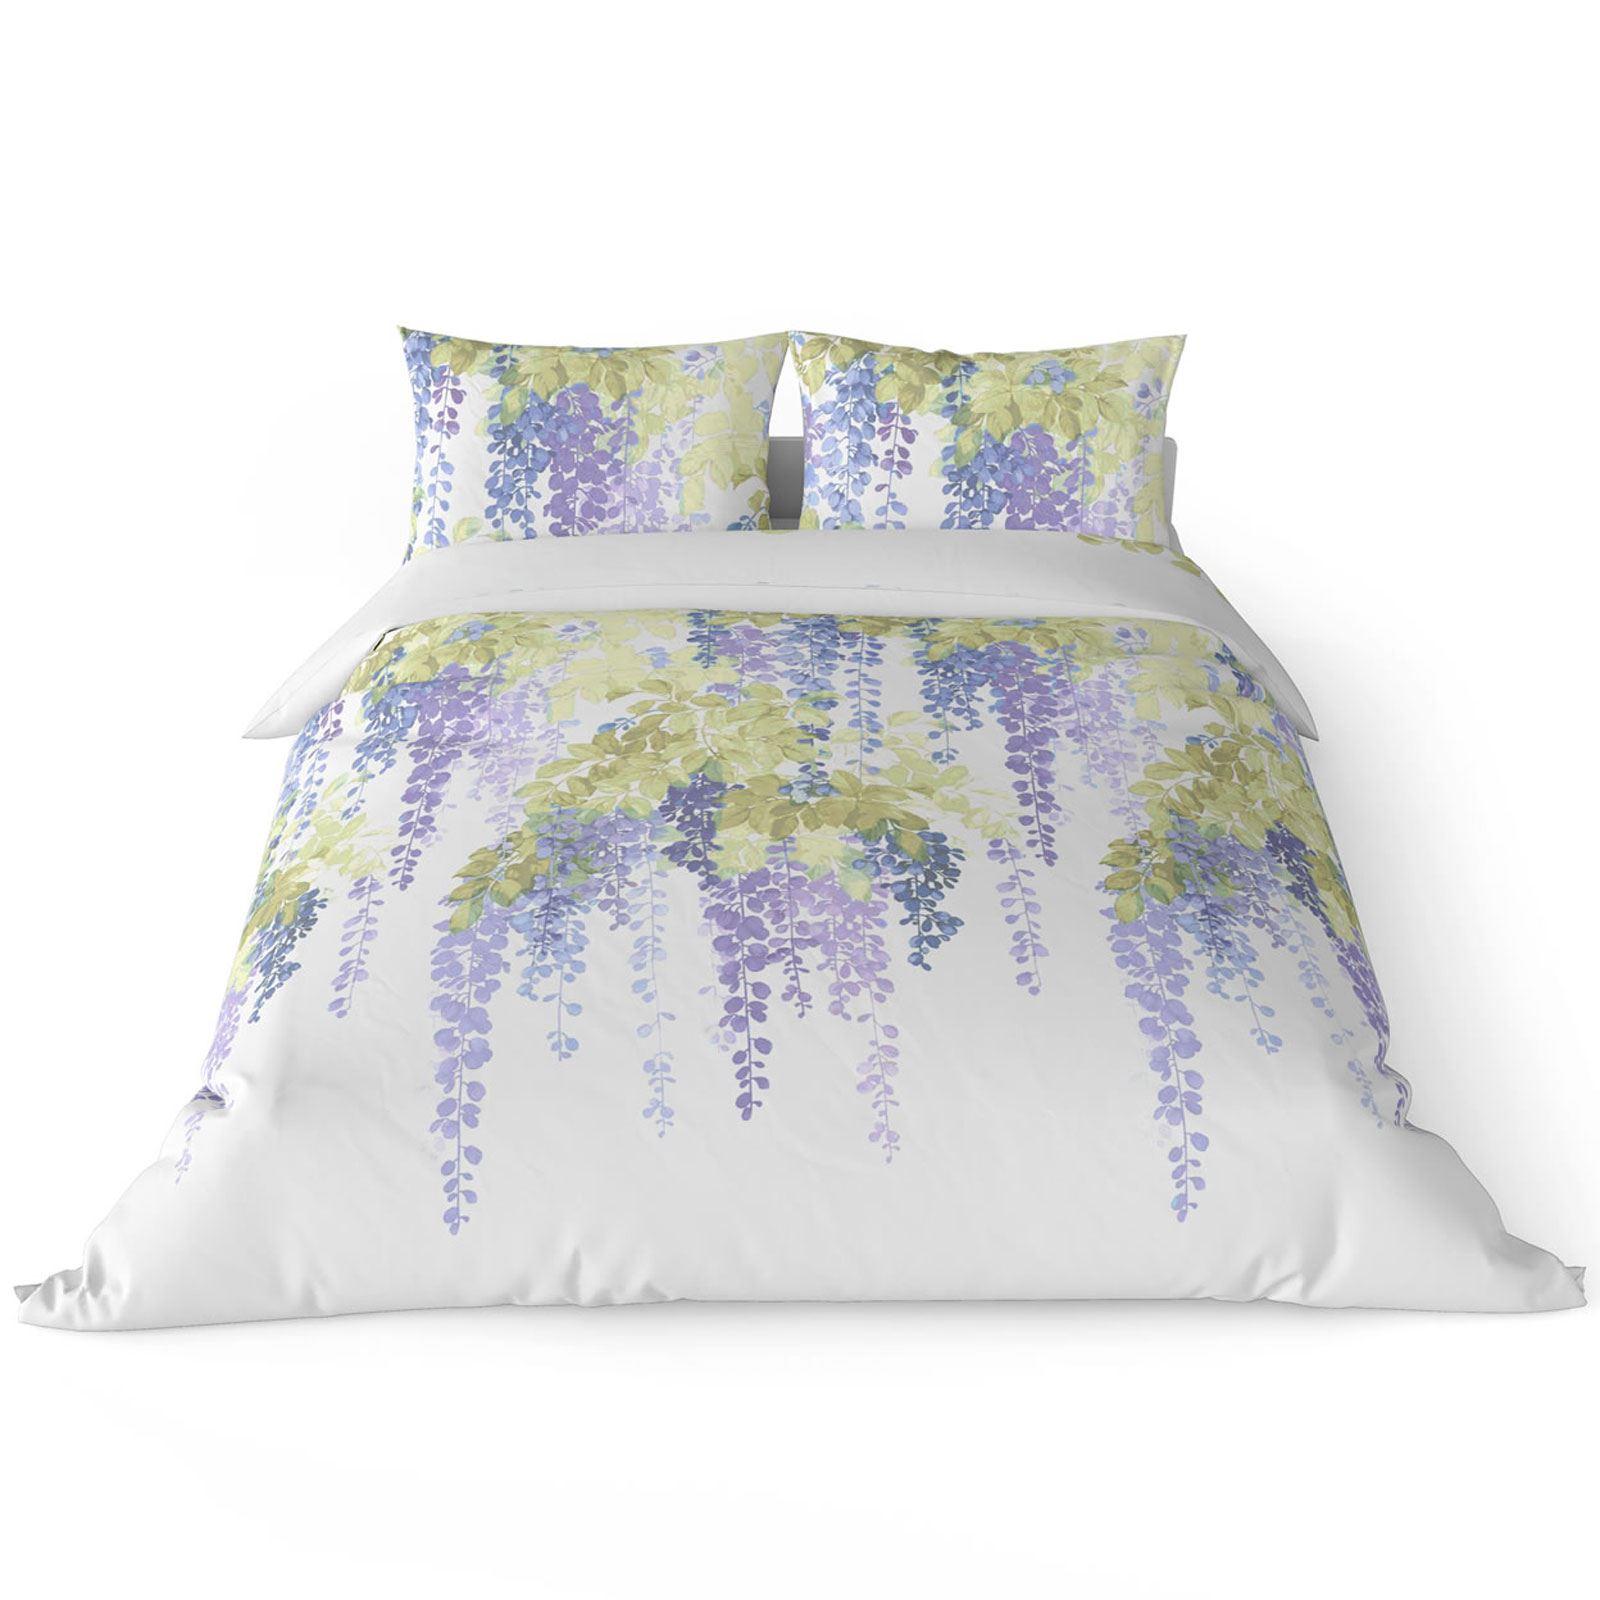 Funda-nordica-azul-azul-marino-verde-azulado-edredon-algodon-estampado-juego-conjuntos-de-cama-cubre miniatura 27